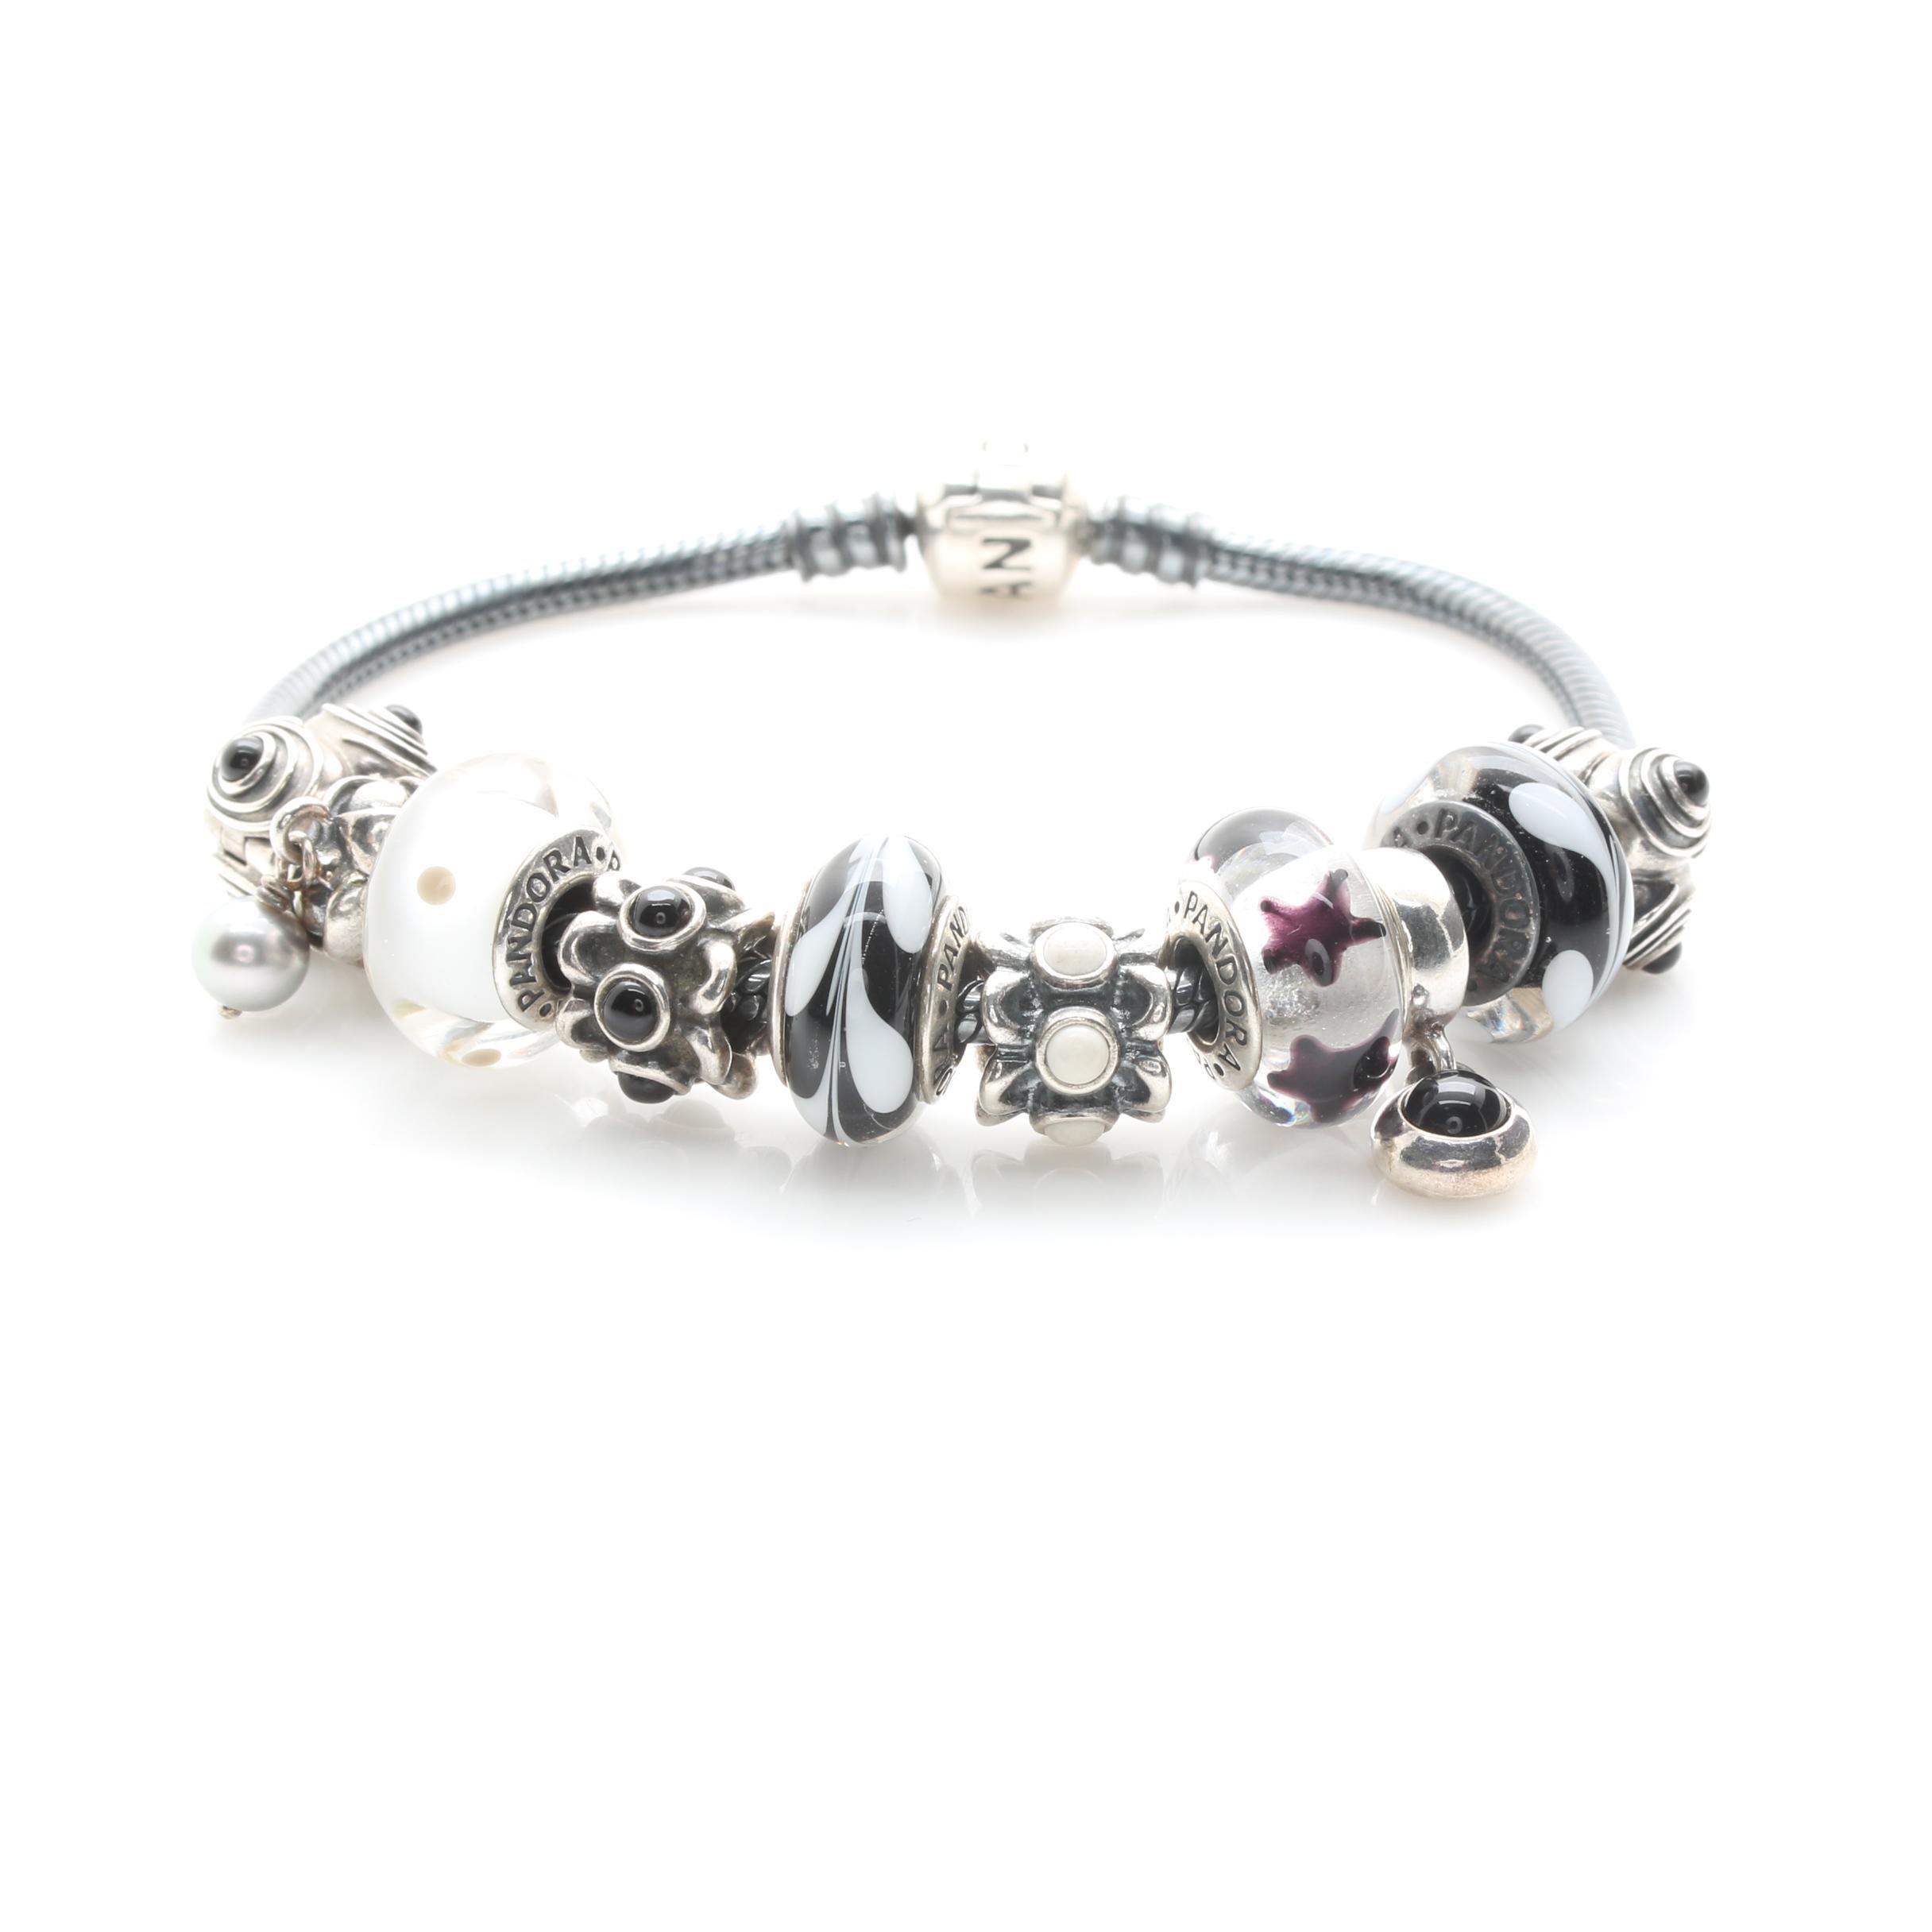 Pandora Sterling Silver Black and White Onyx Charm Bracelet